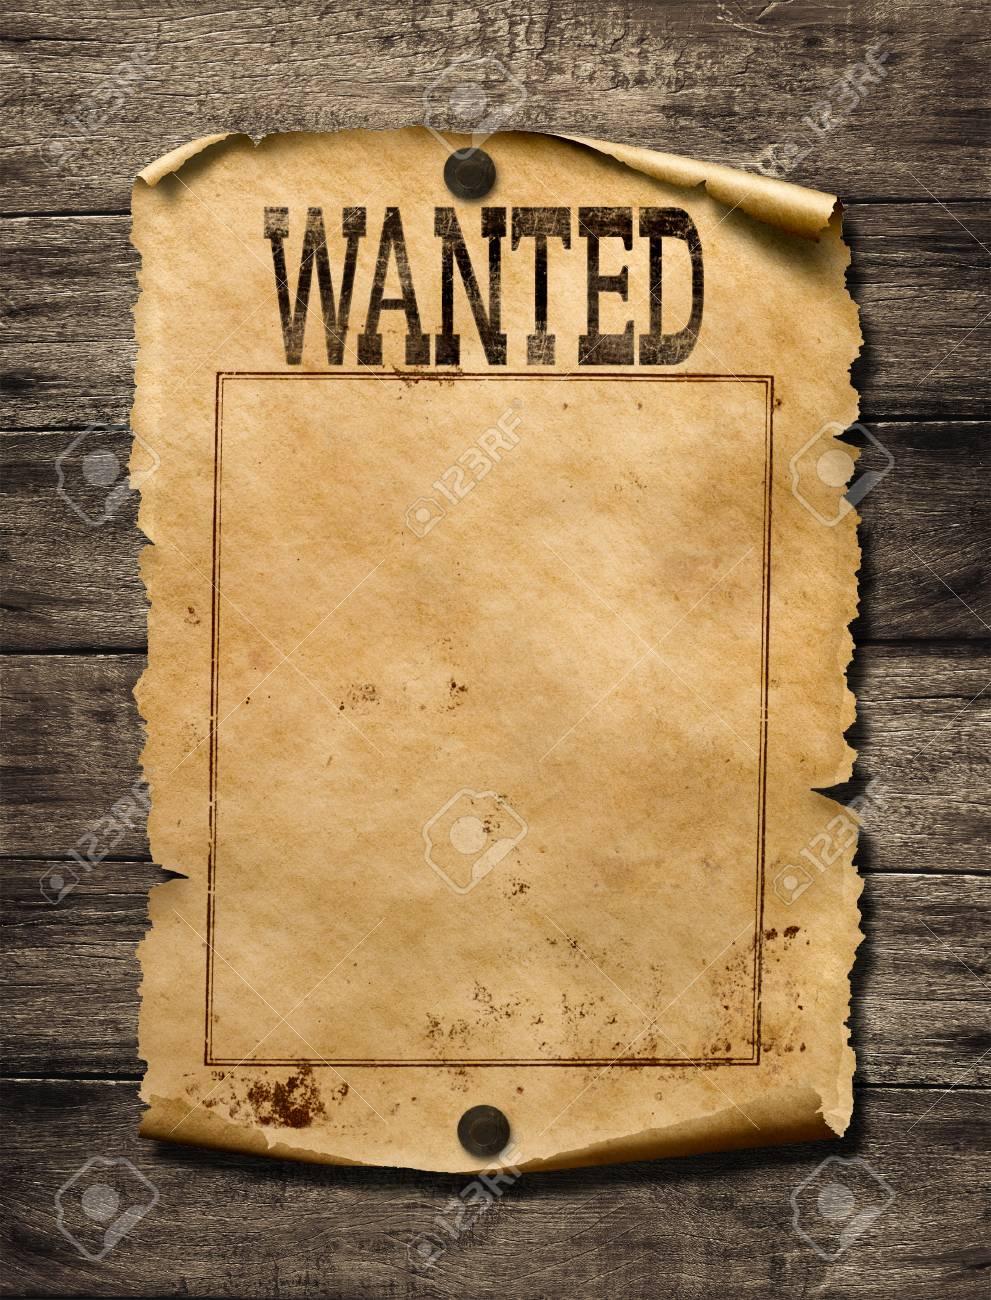 Wanted for reward poster 3d illustration - 75745859